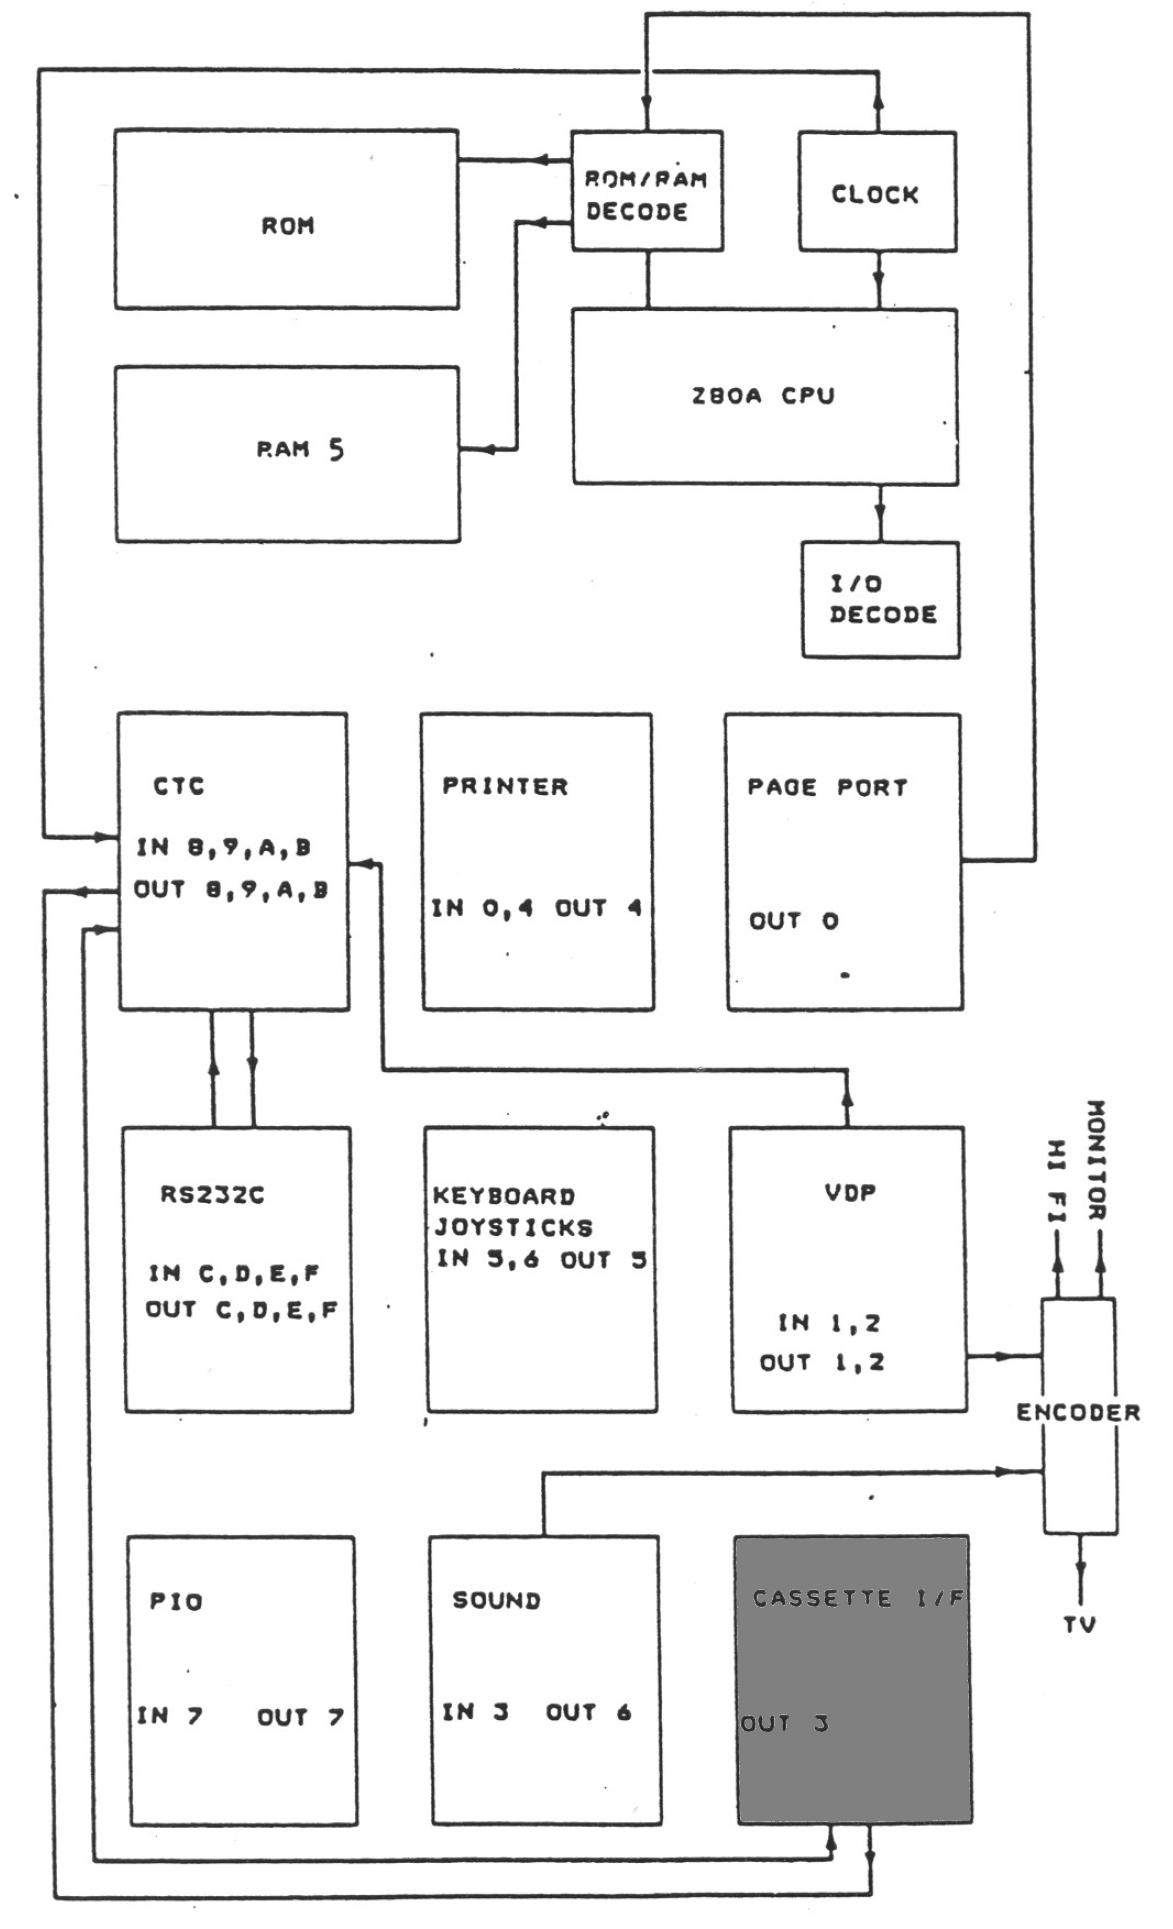 memotech mtx 512  o port allocation